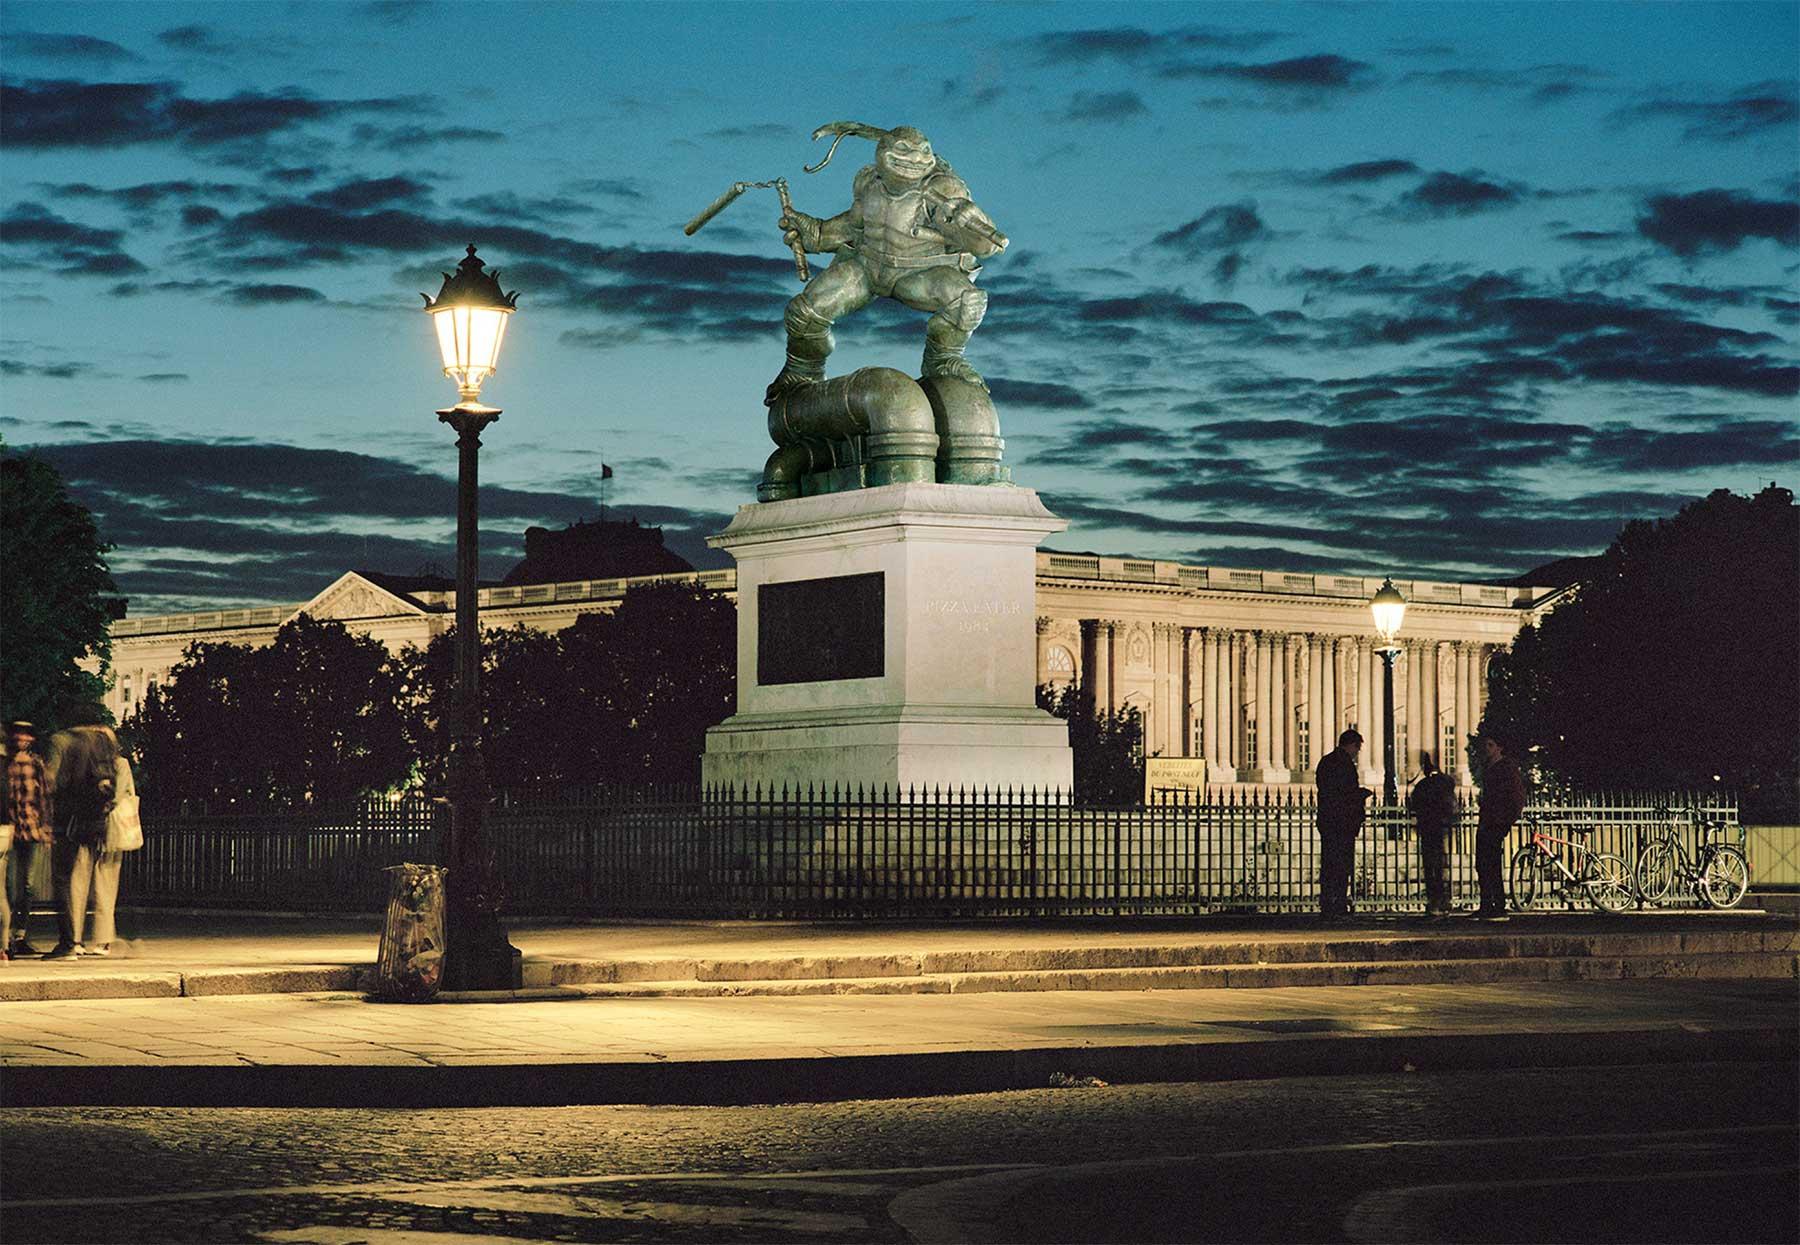 Popkulturen-Statuen Monuments_Benoit-Lapray_01